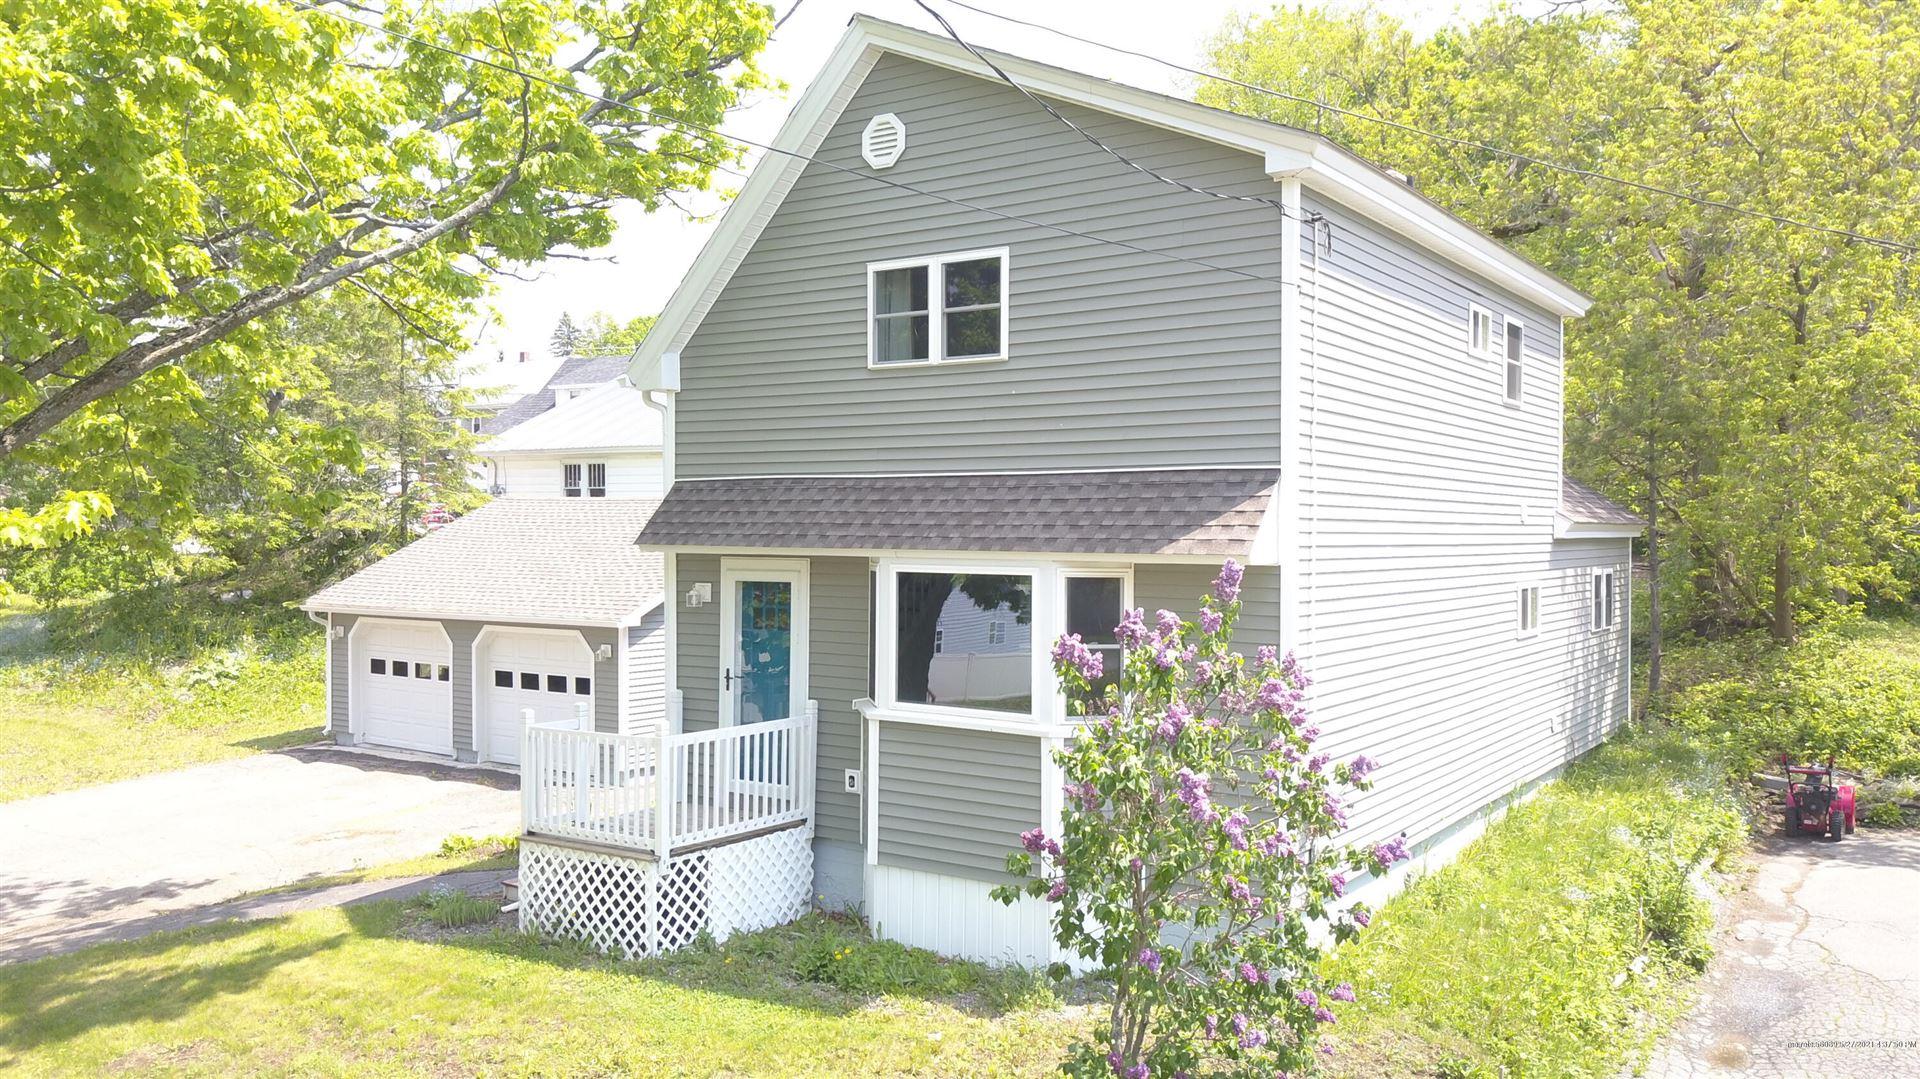 Photo of 47 Oak Street, Presque Isle, ME 04769 (MLS # 1493622)